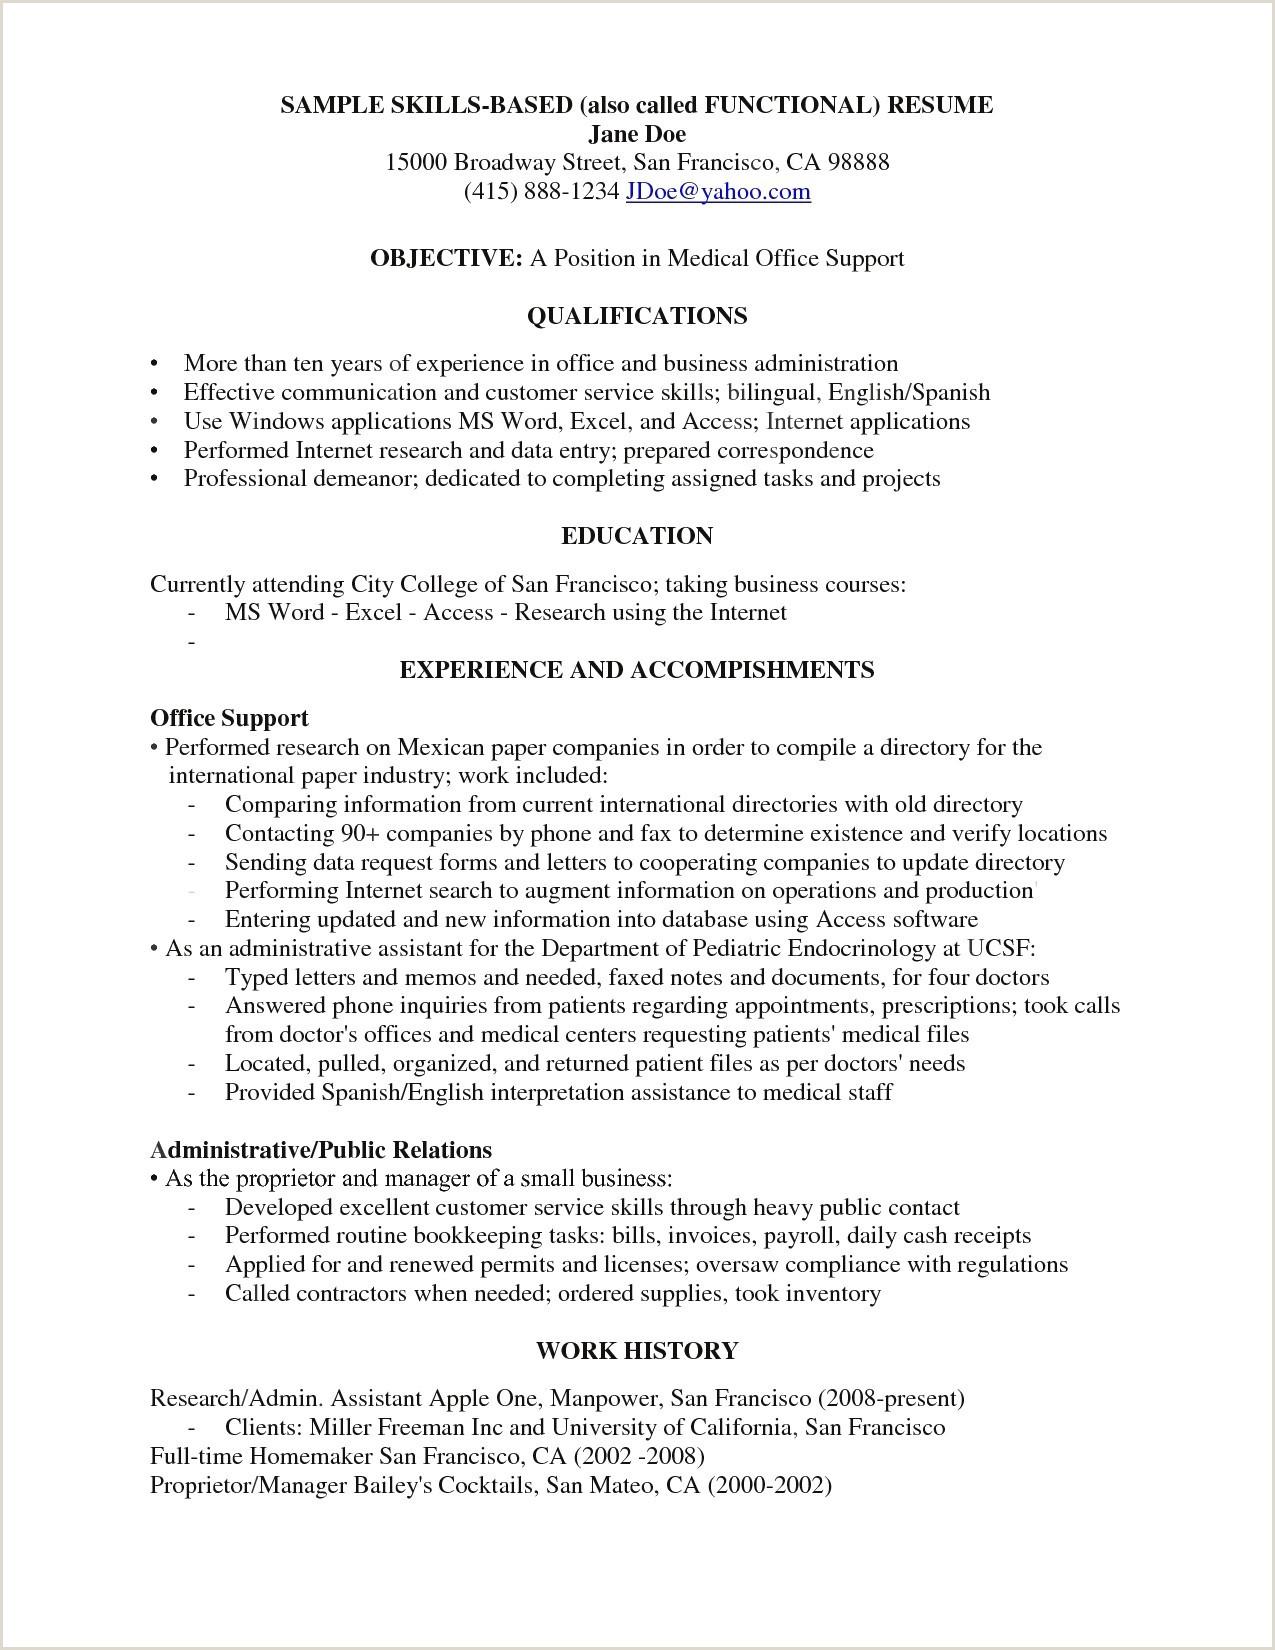 Templates For Microsoft Word Archives Gunalert Co Unique